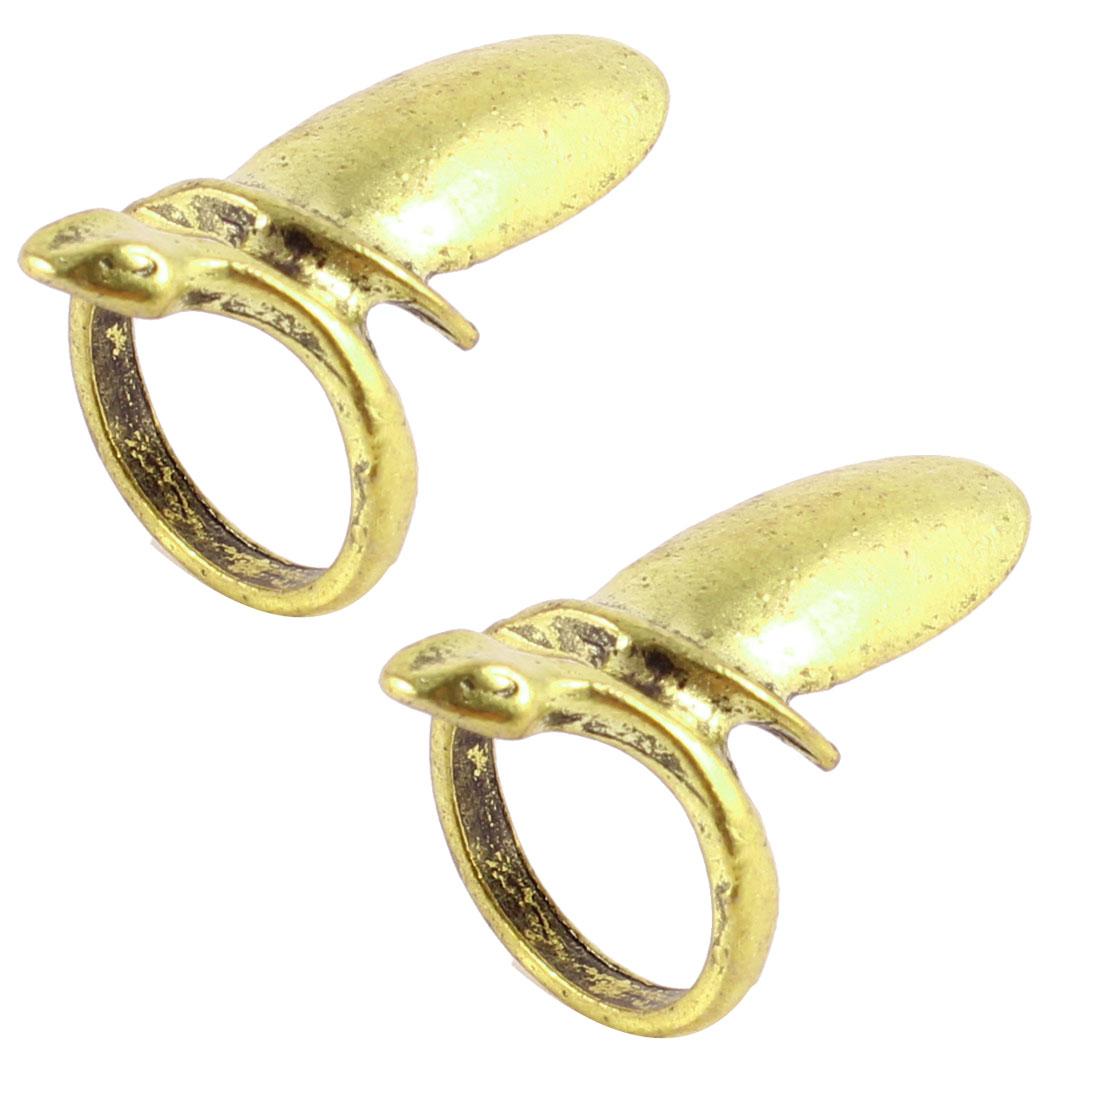 2 Pcs Bronze Tone Meatl Nail Detail Finger Ring US 2 1/4